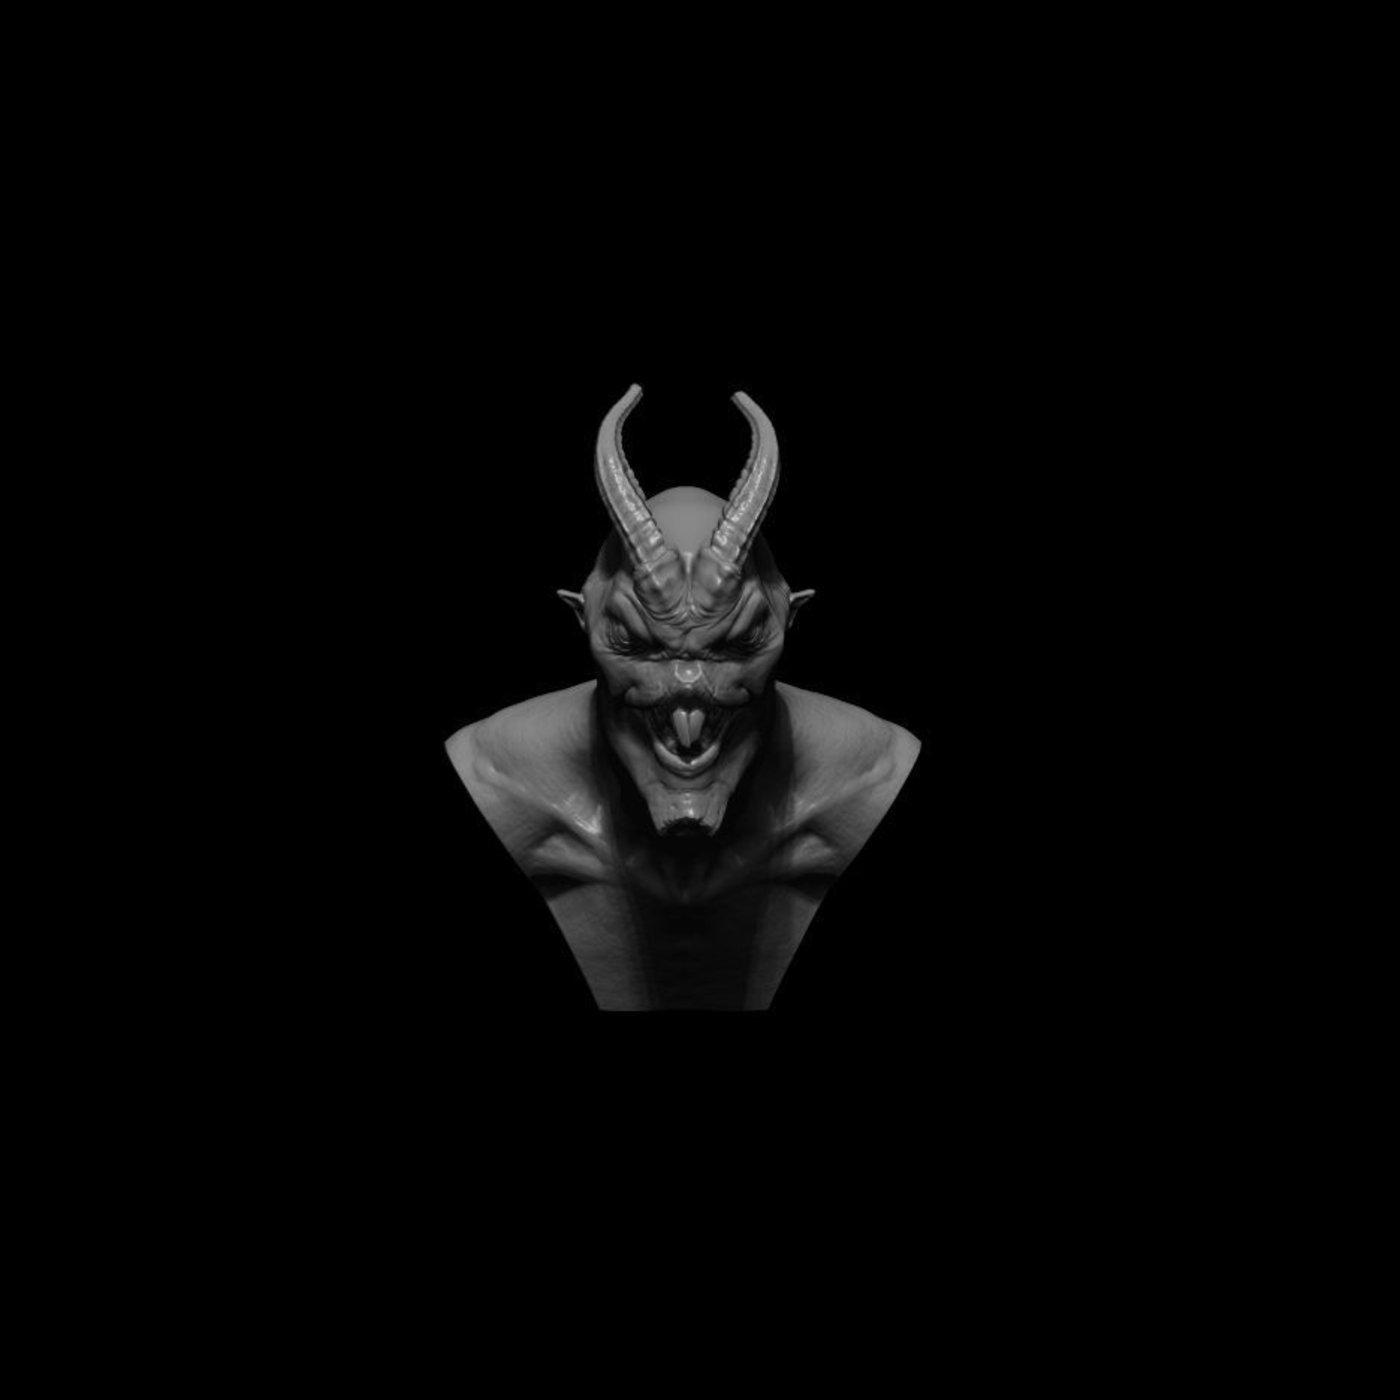 Demon 01